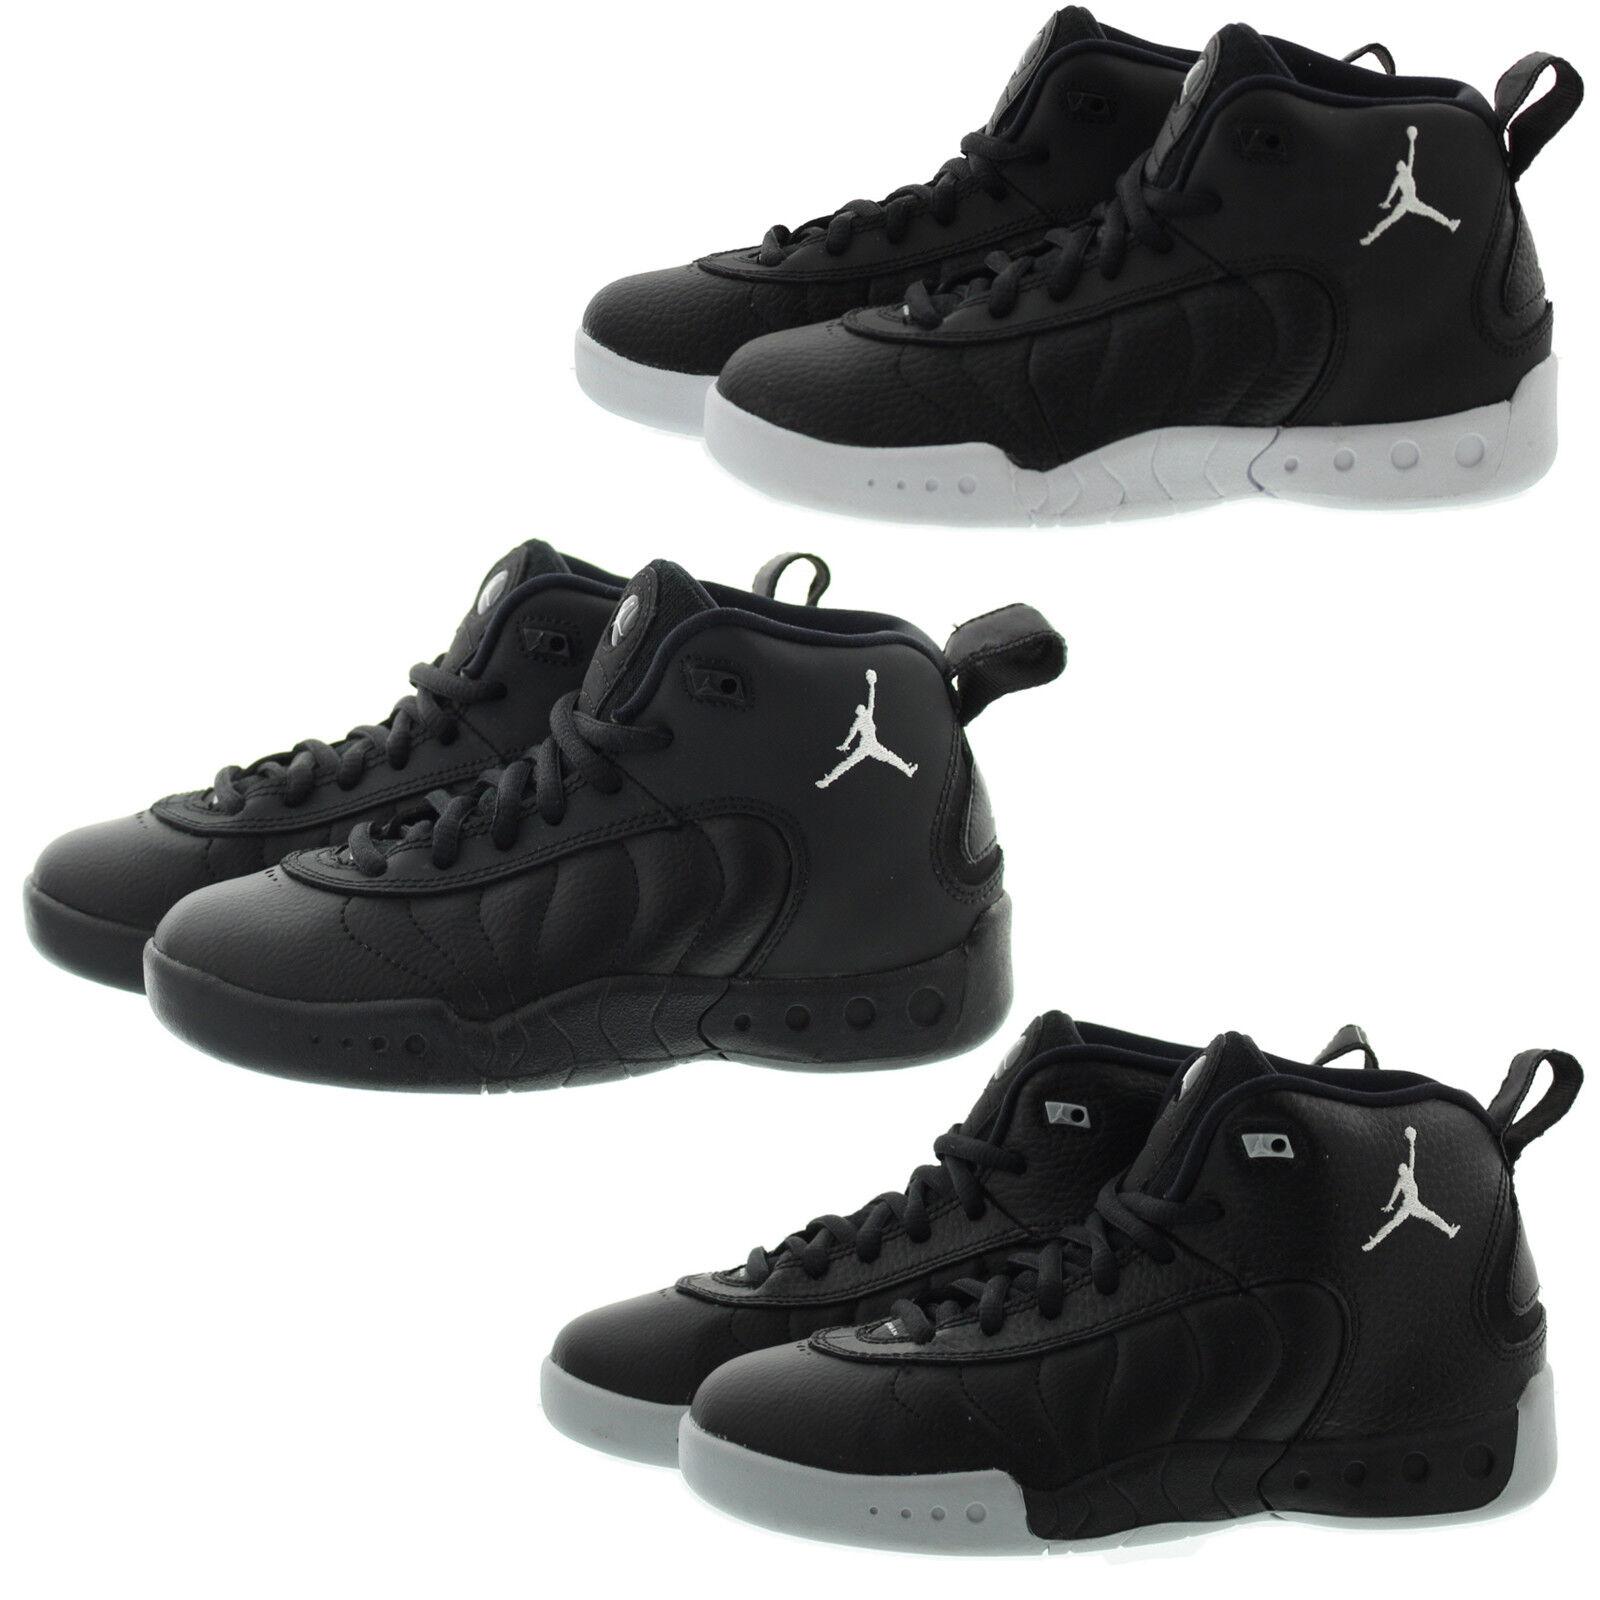 Sports & Outdoor Shoes Nike Jordan Jumpman Pro BP Preschool